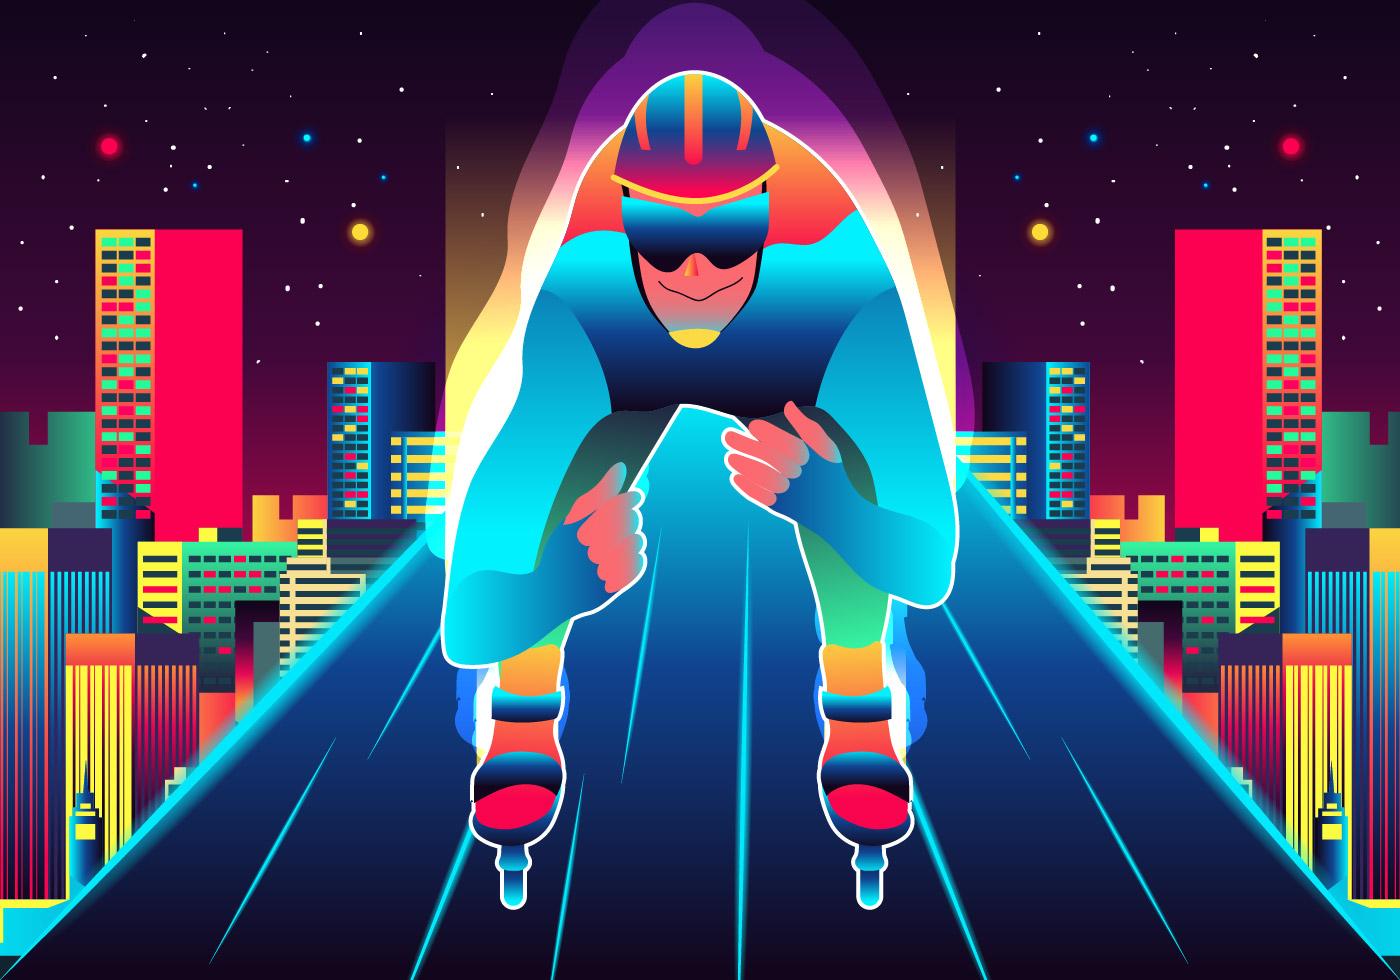 Man Skating On Roller Blade Download Free Vectors